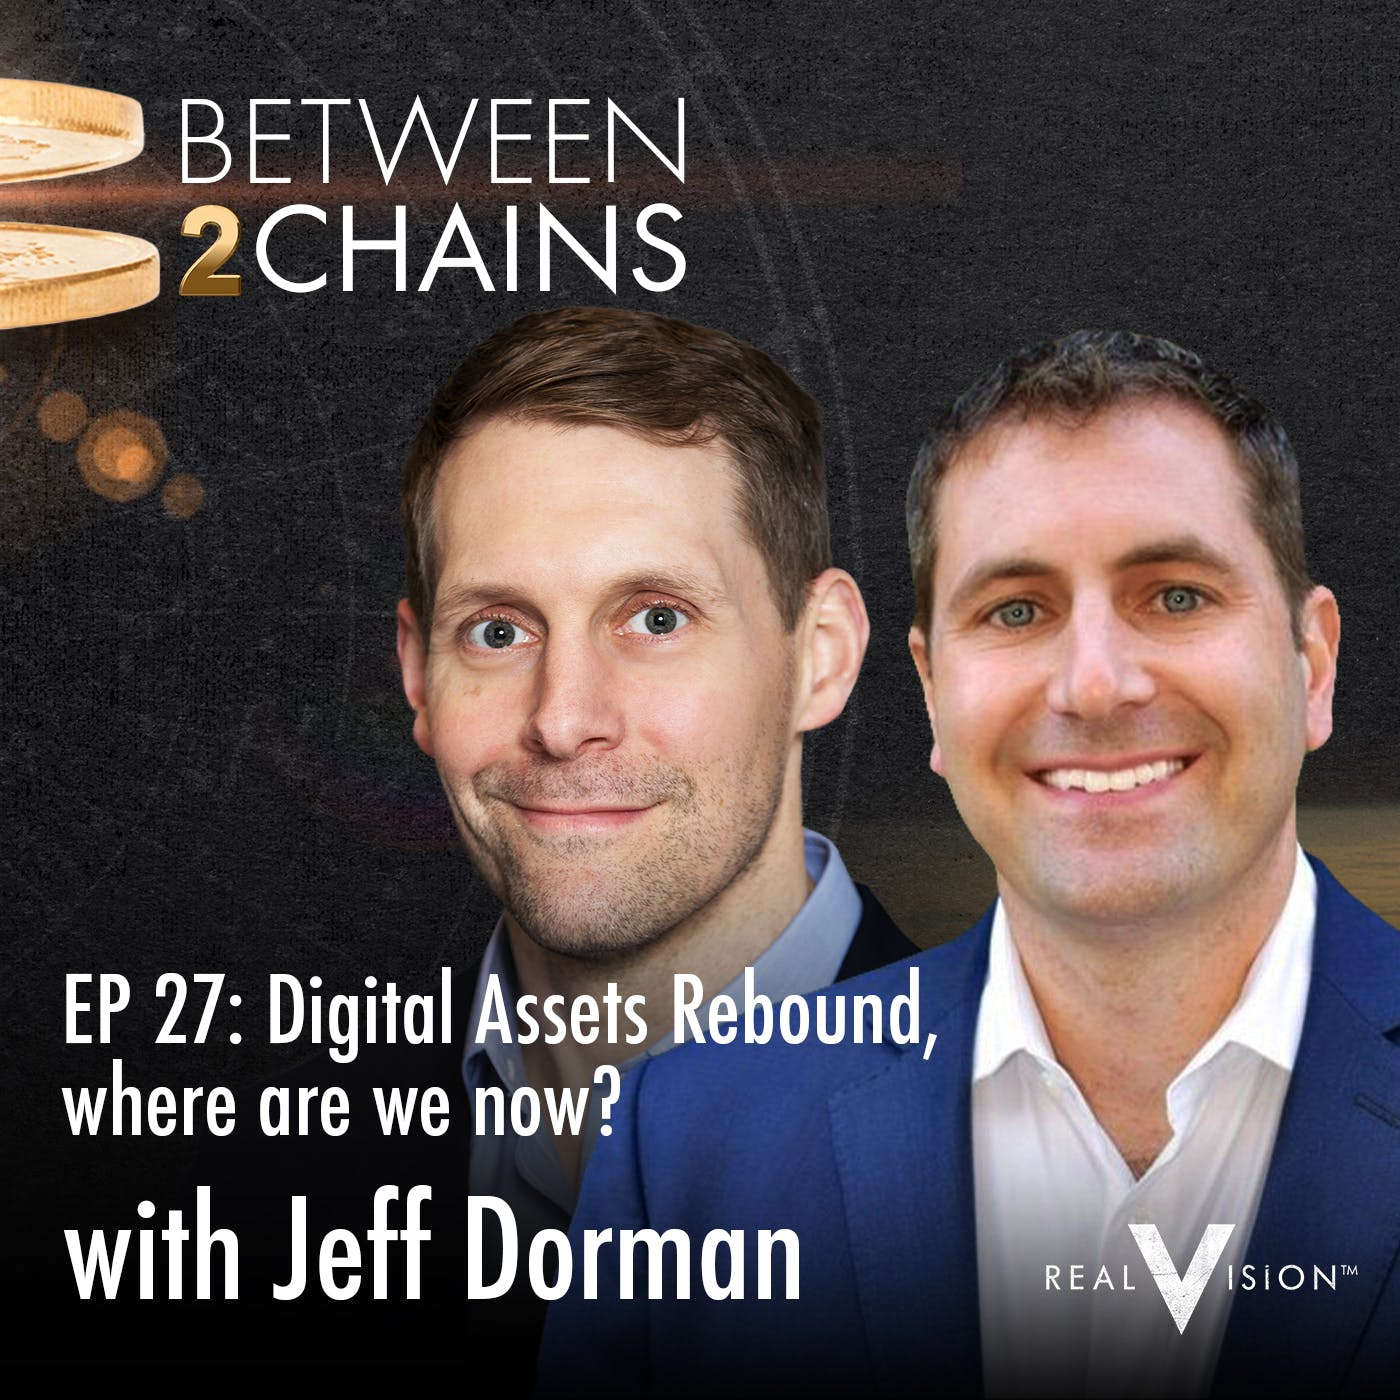 B2C0027: Digital Assets Rebound, Where are we Now? ( w/ Jeff Dorman )